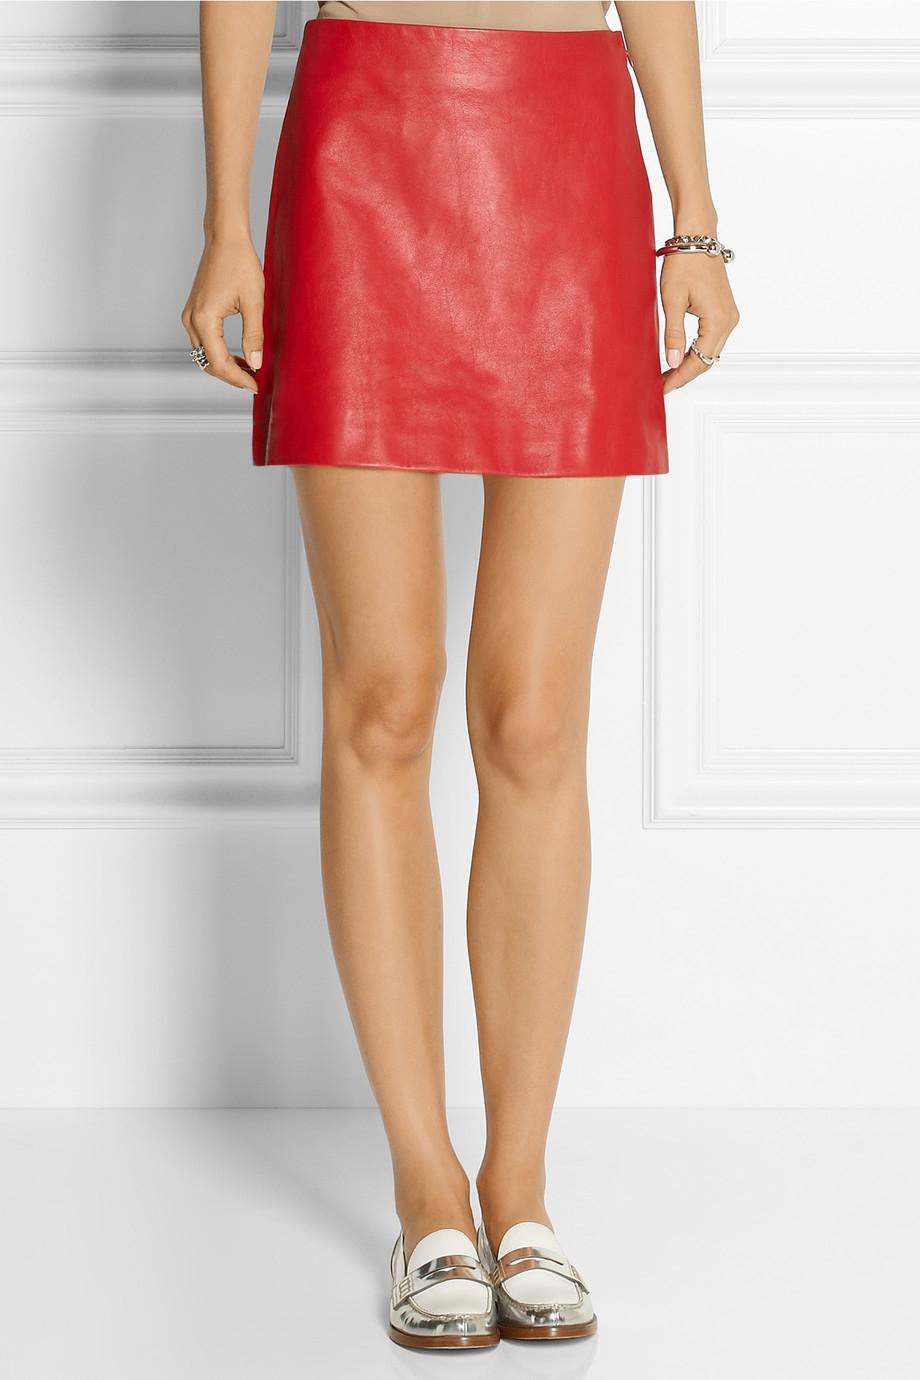 Red Leather Mini Skirt - Dress Ala